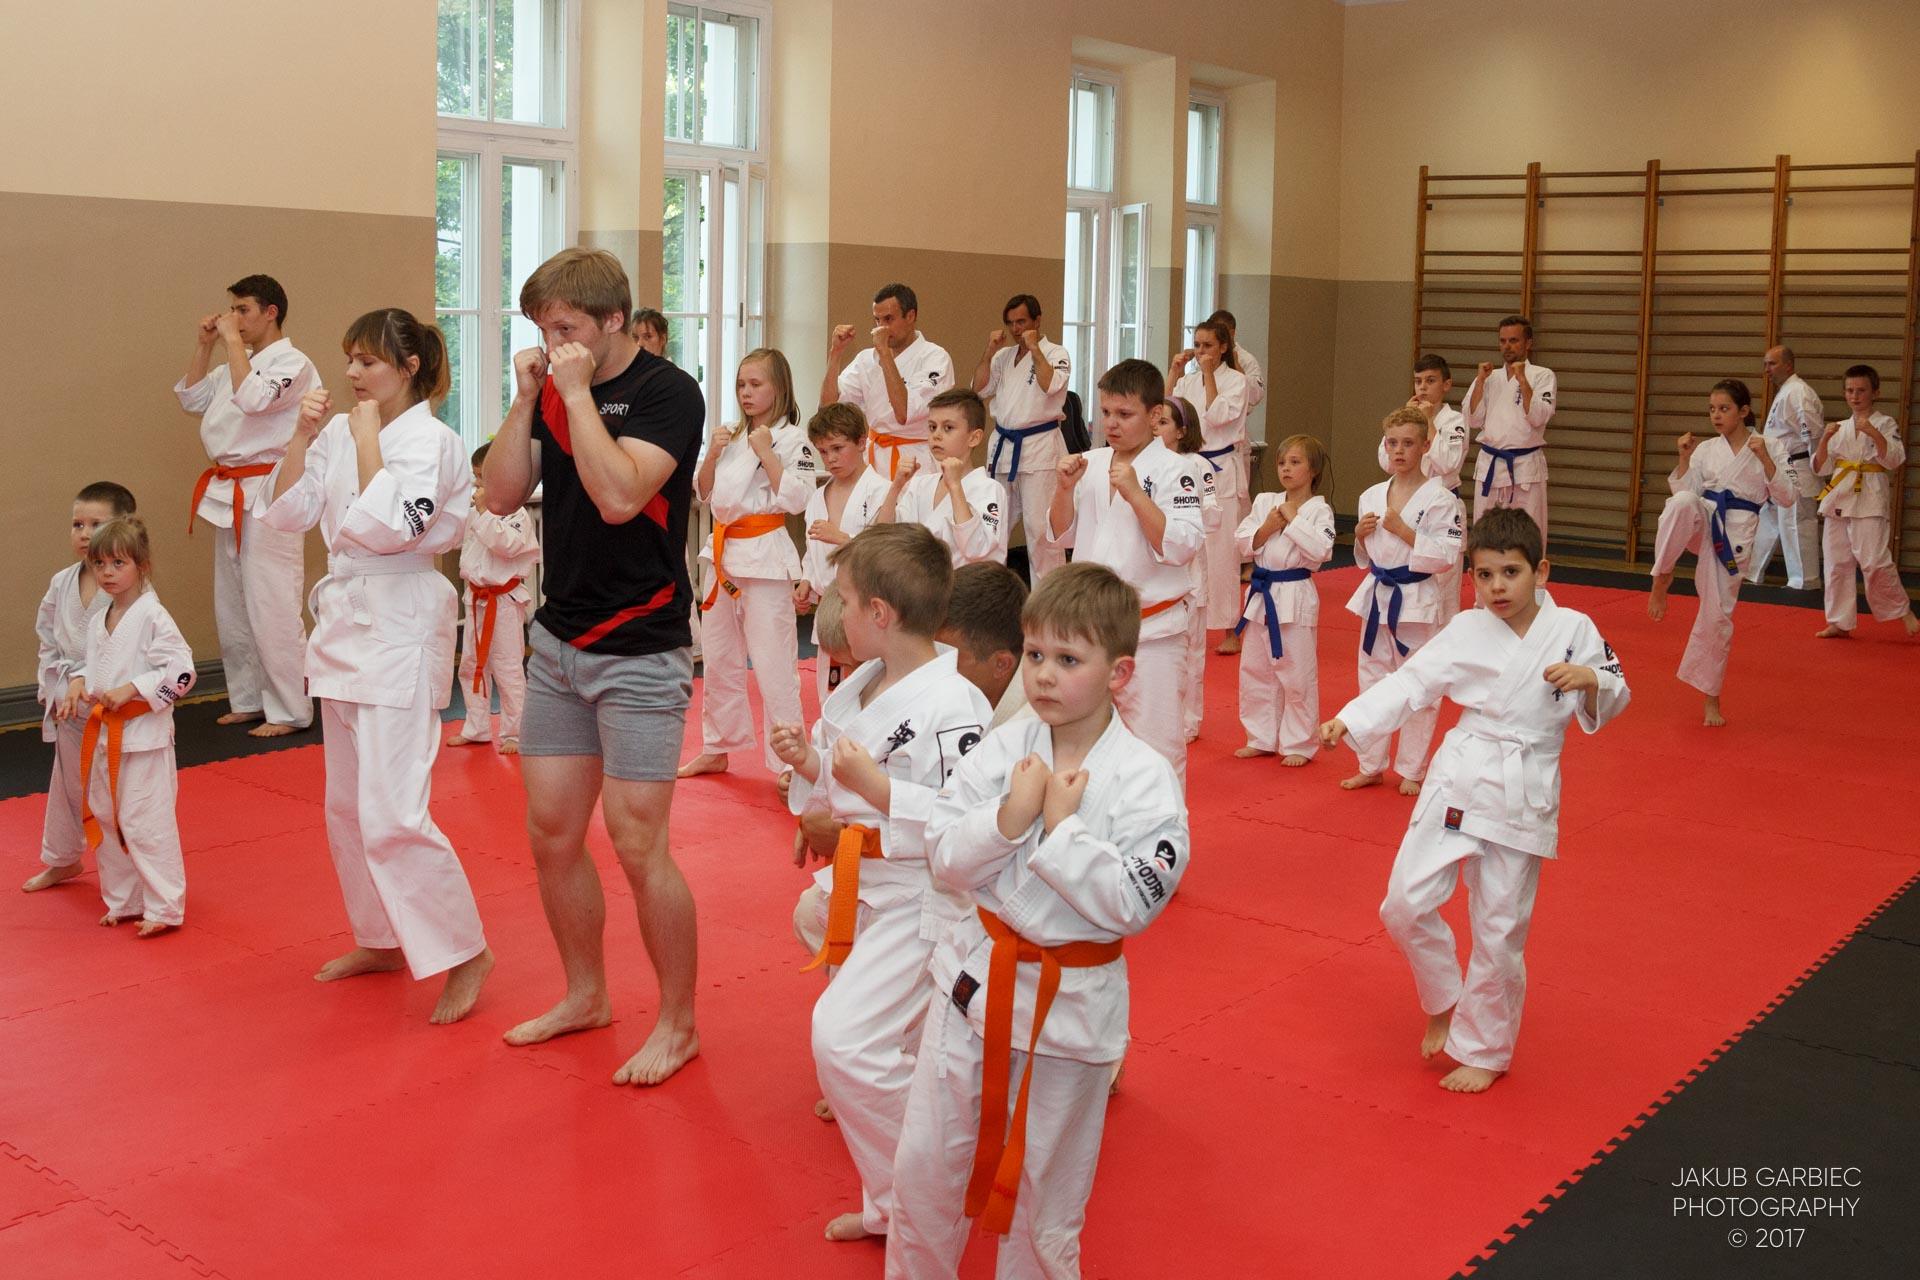 egzamin-karate-mistrz-mariusz-mazur-klub-karate-shodan-2017-06-02-18